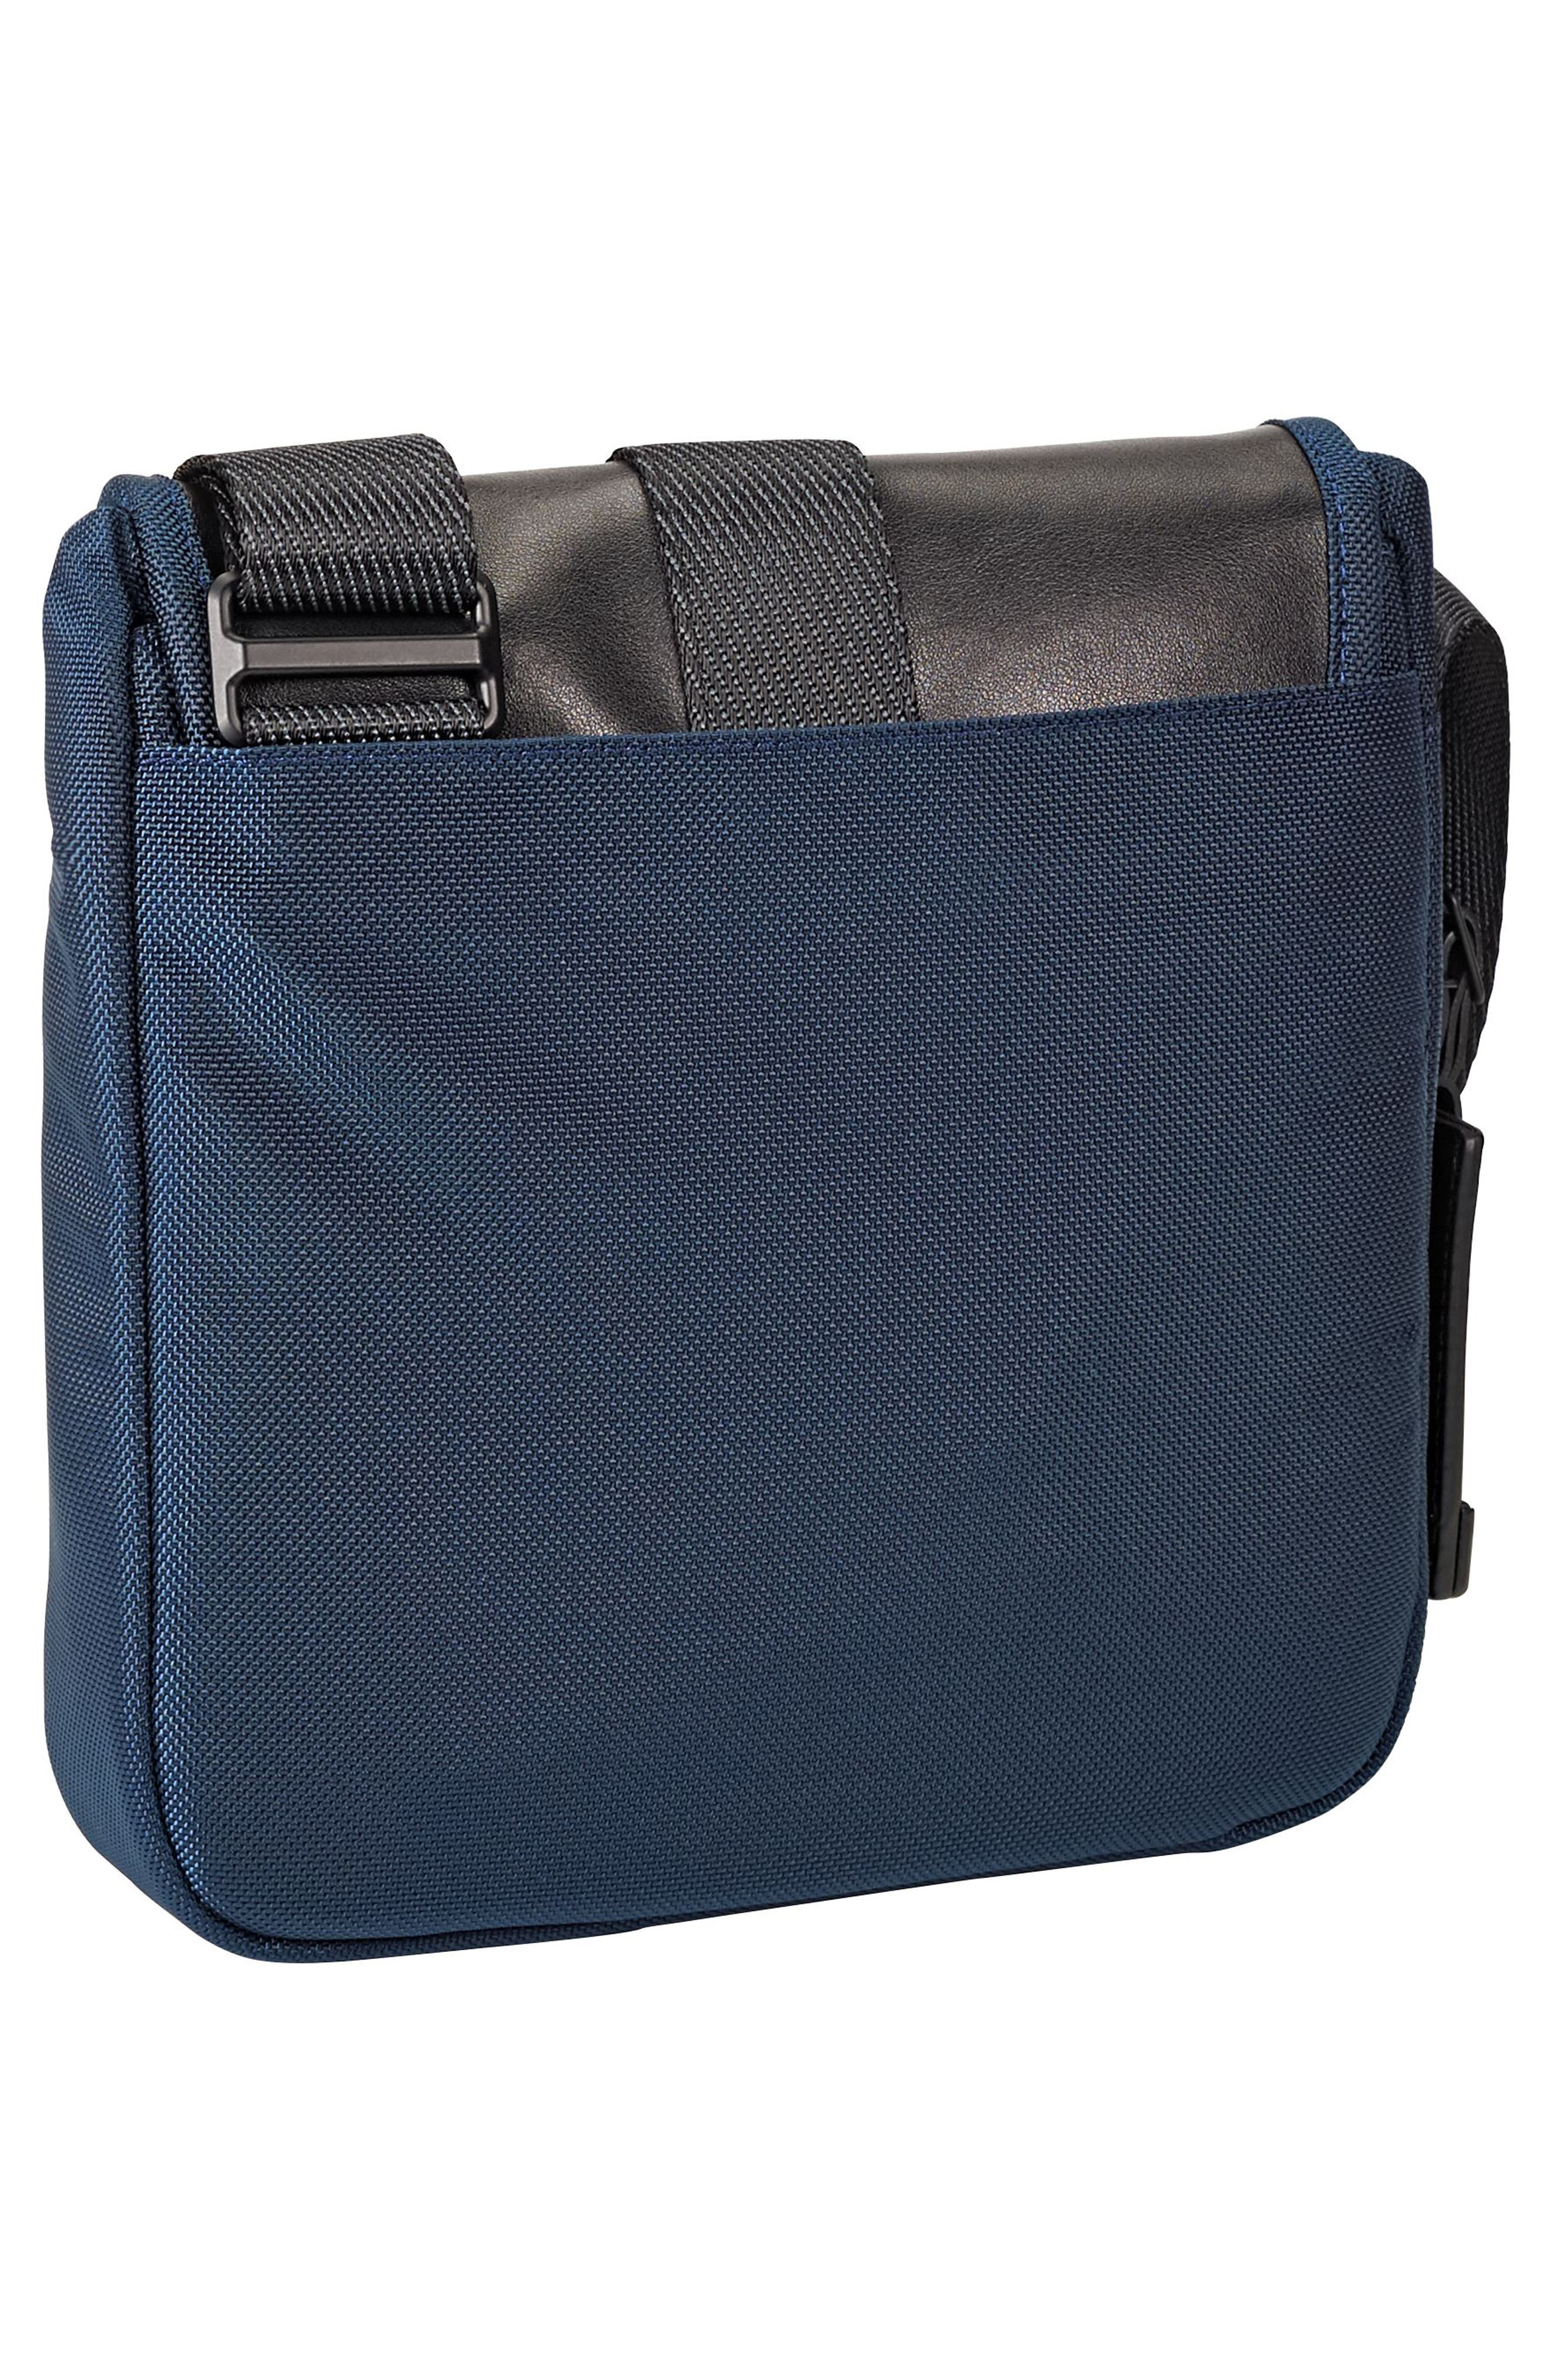 Alpha Bravo - Barton Crossbody Bag,                             Alternate thumbnail 3, color,                             Navy